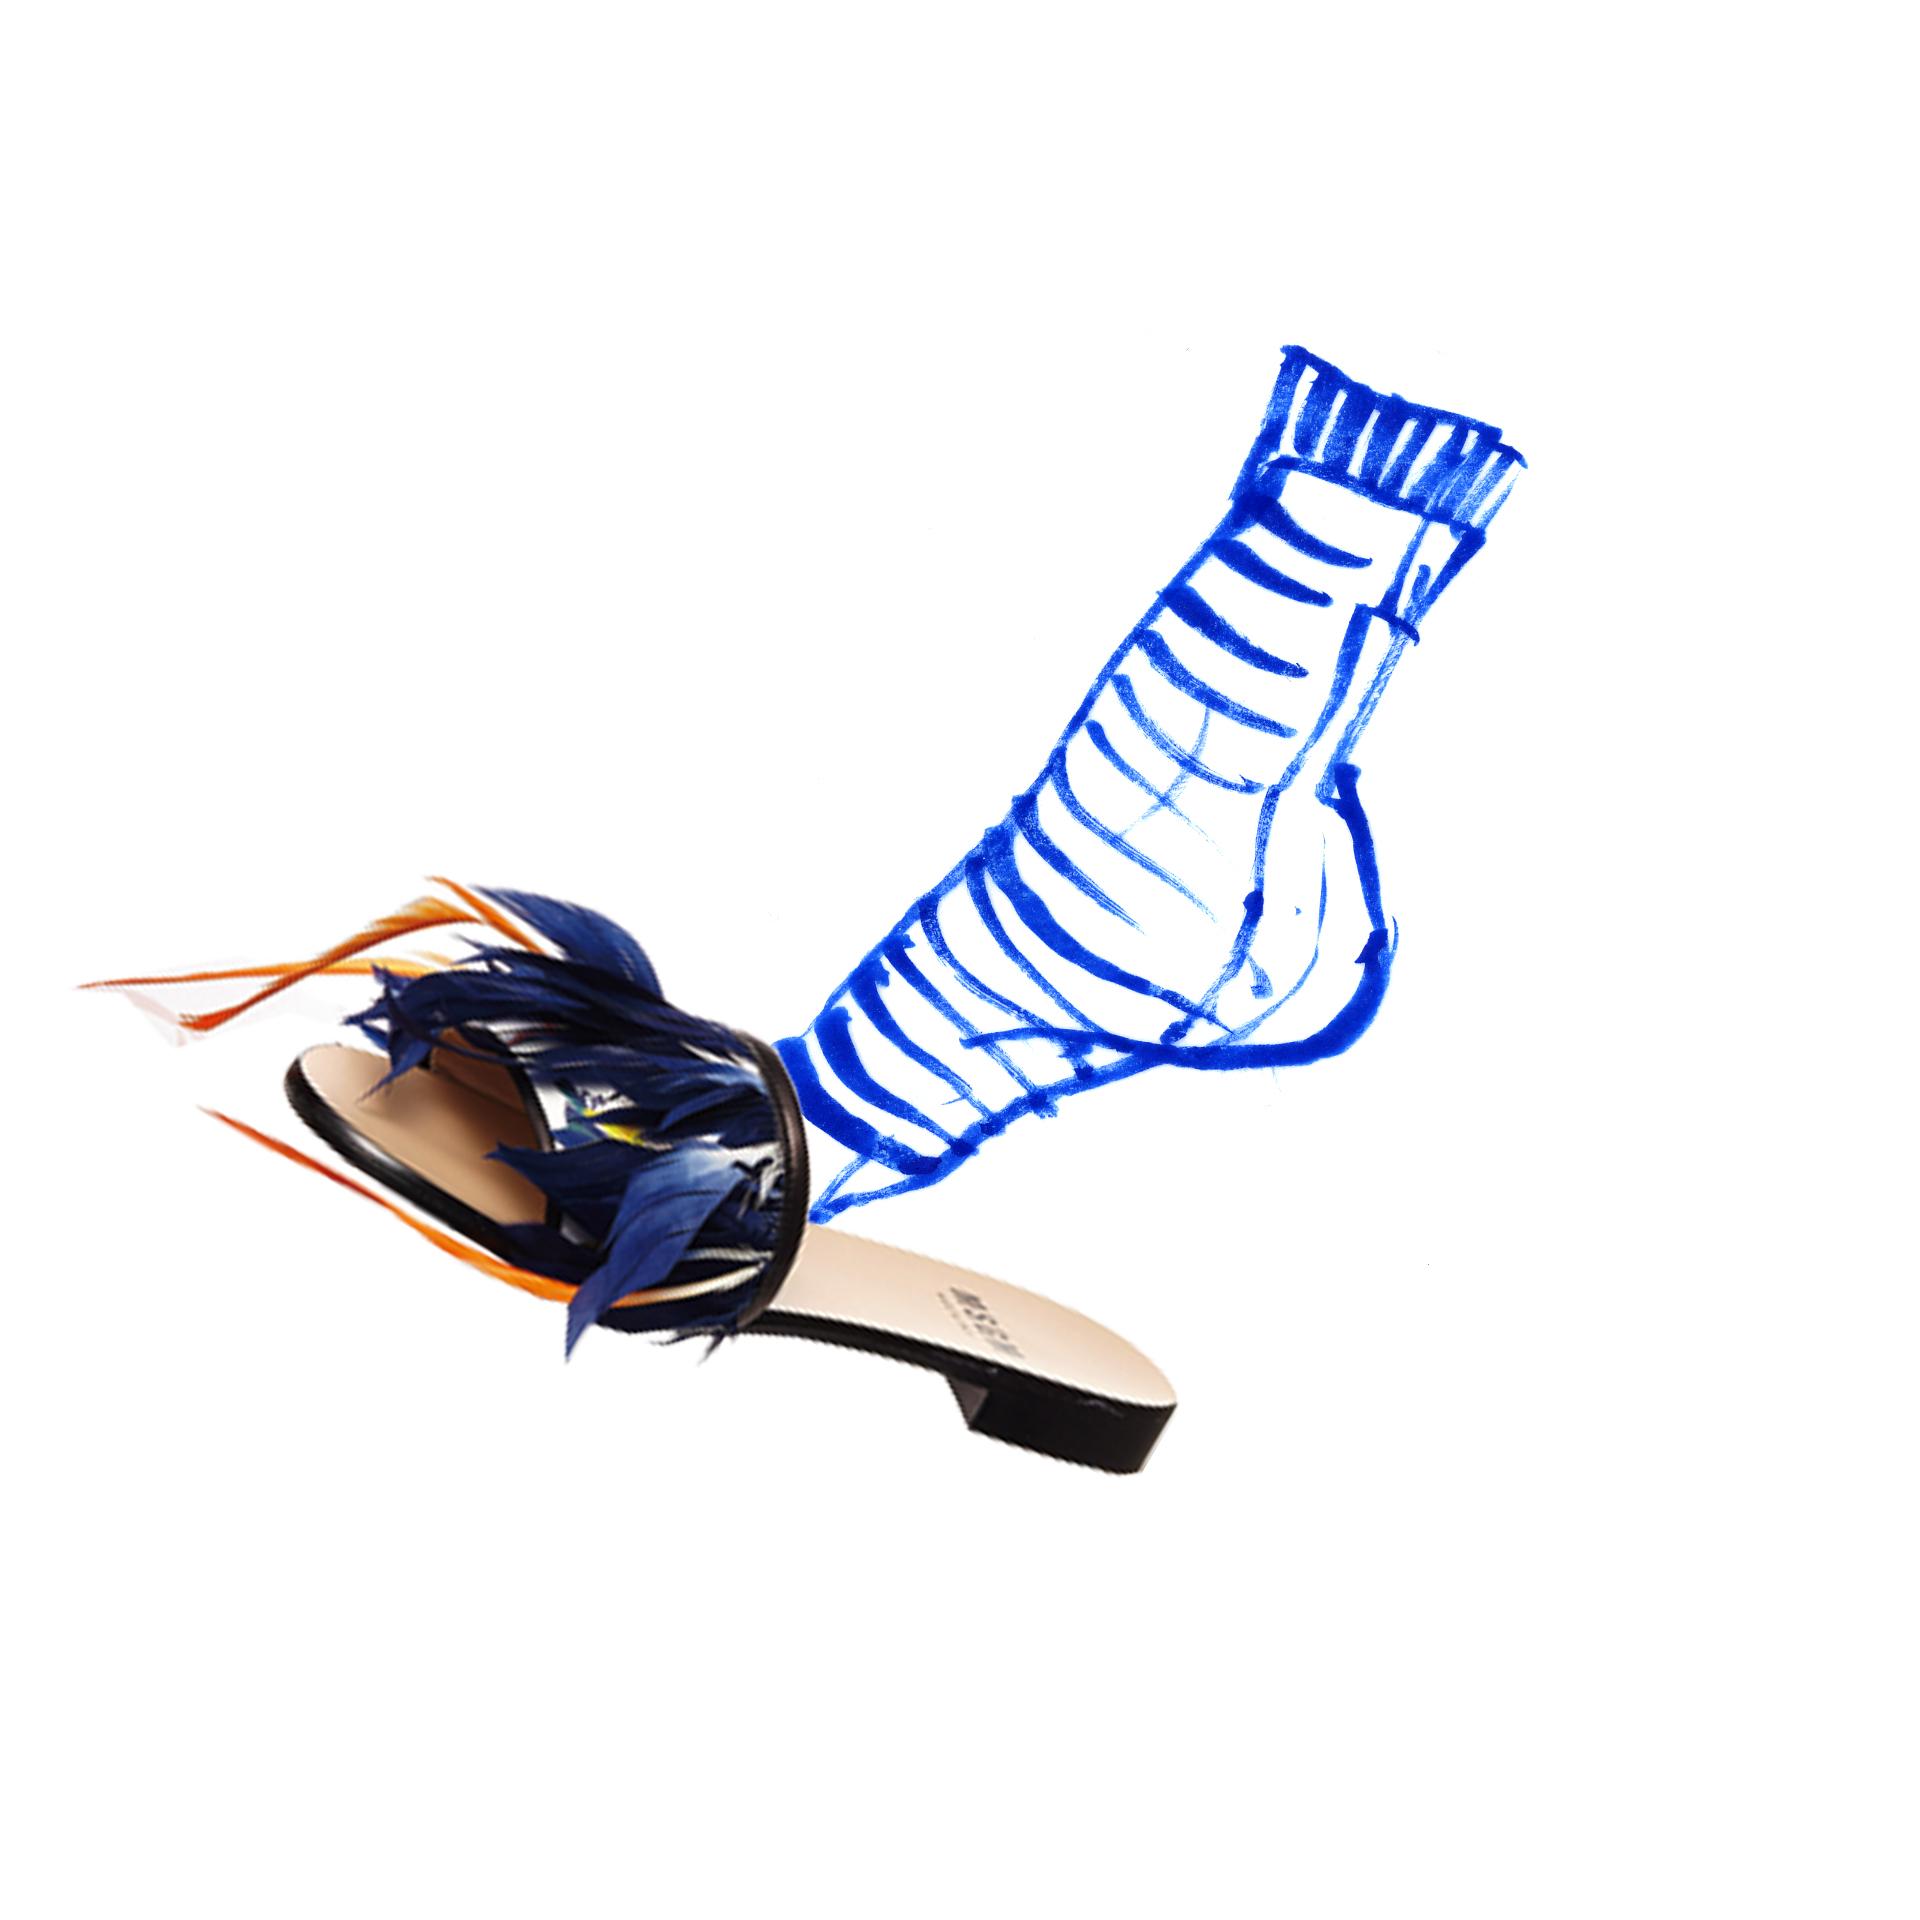 MSGM shoe editorial for L'officiel Japan